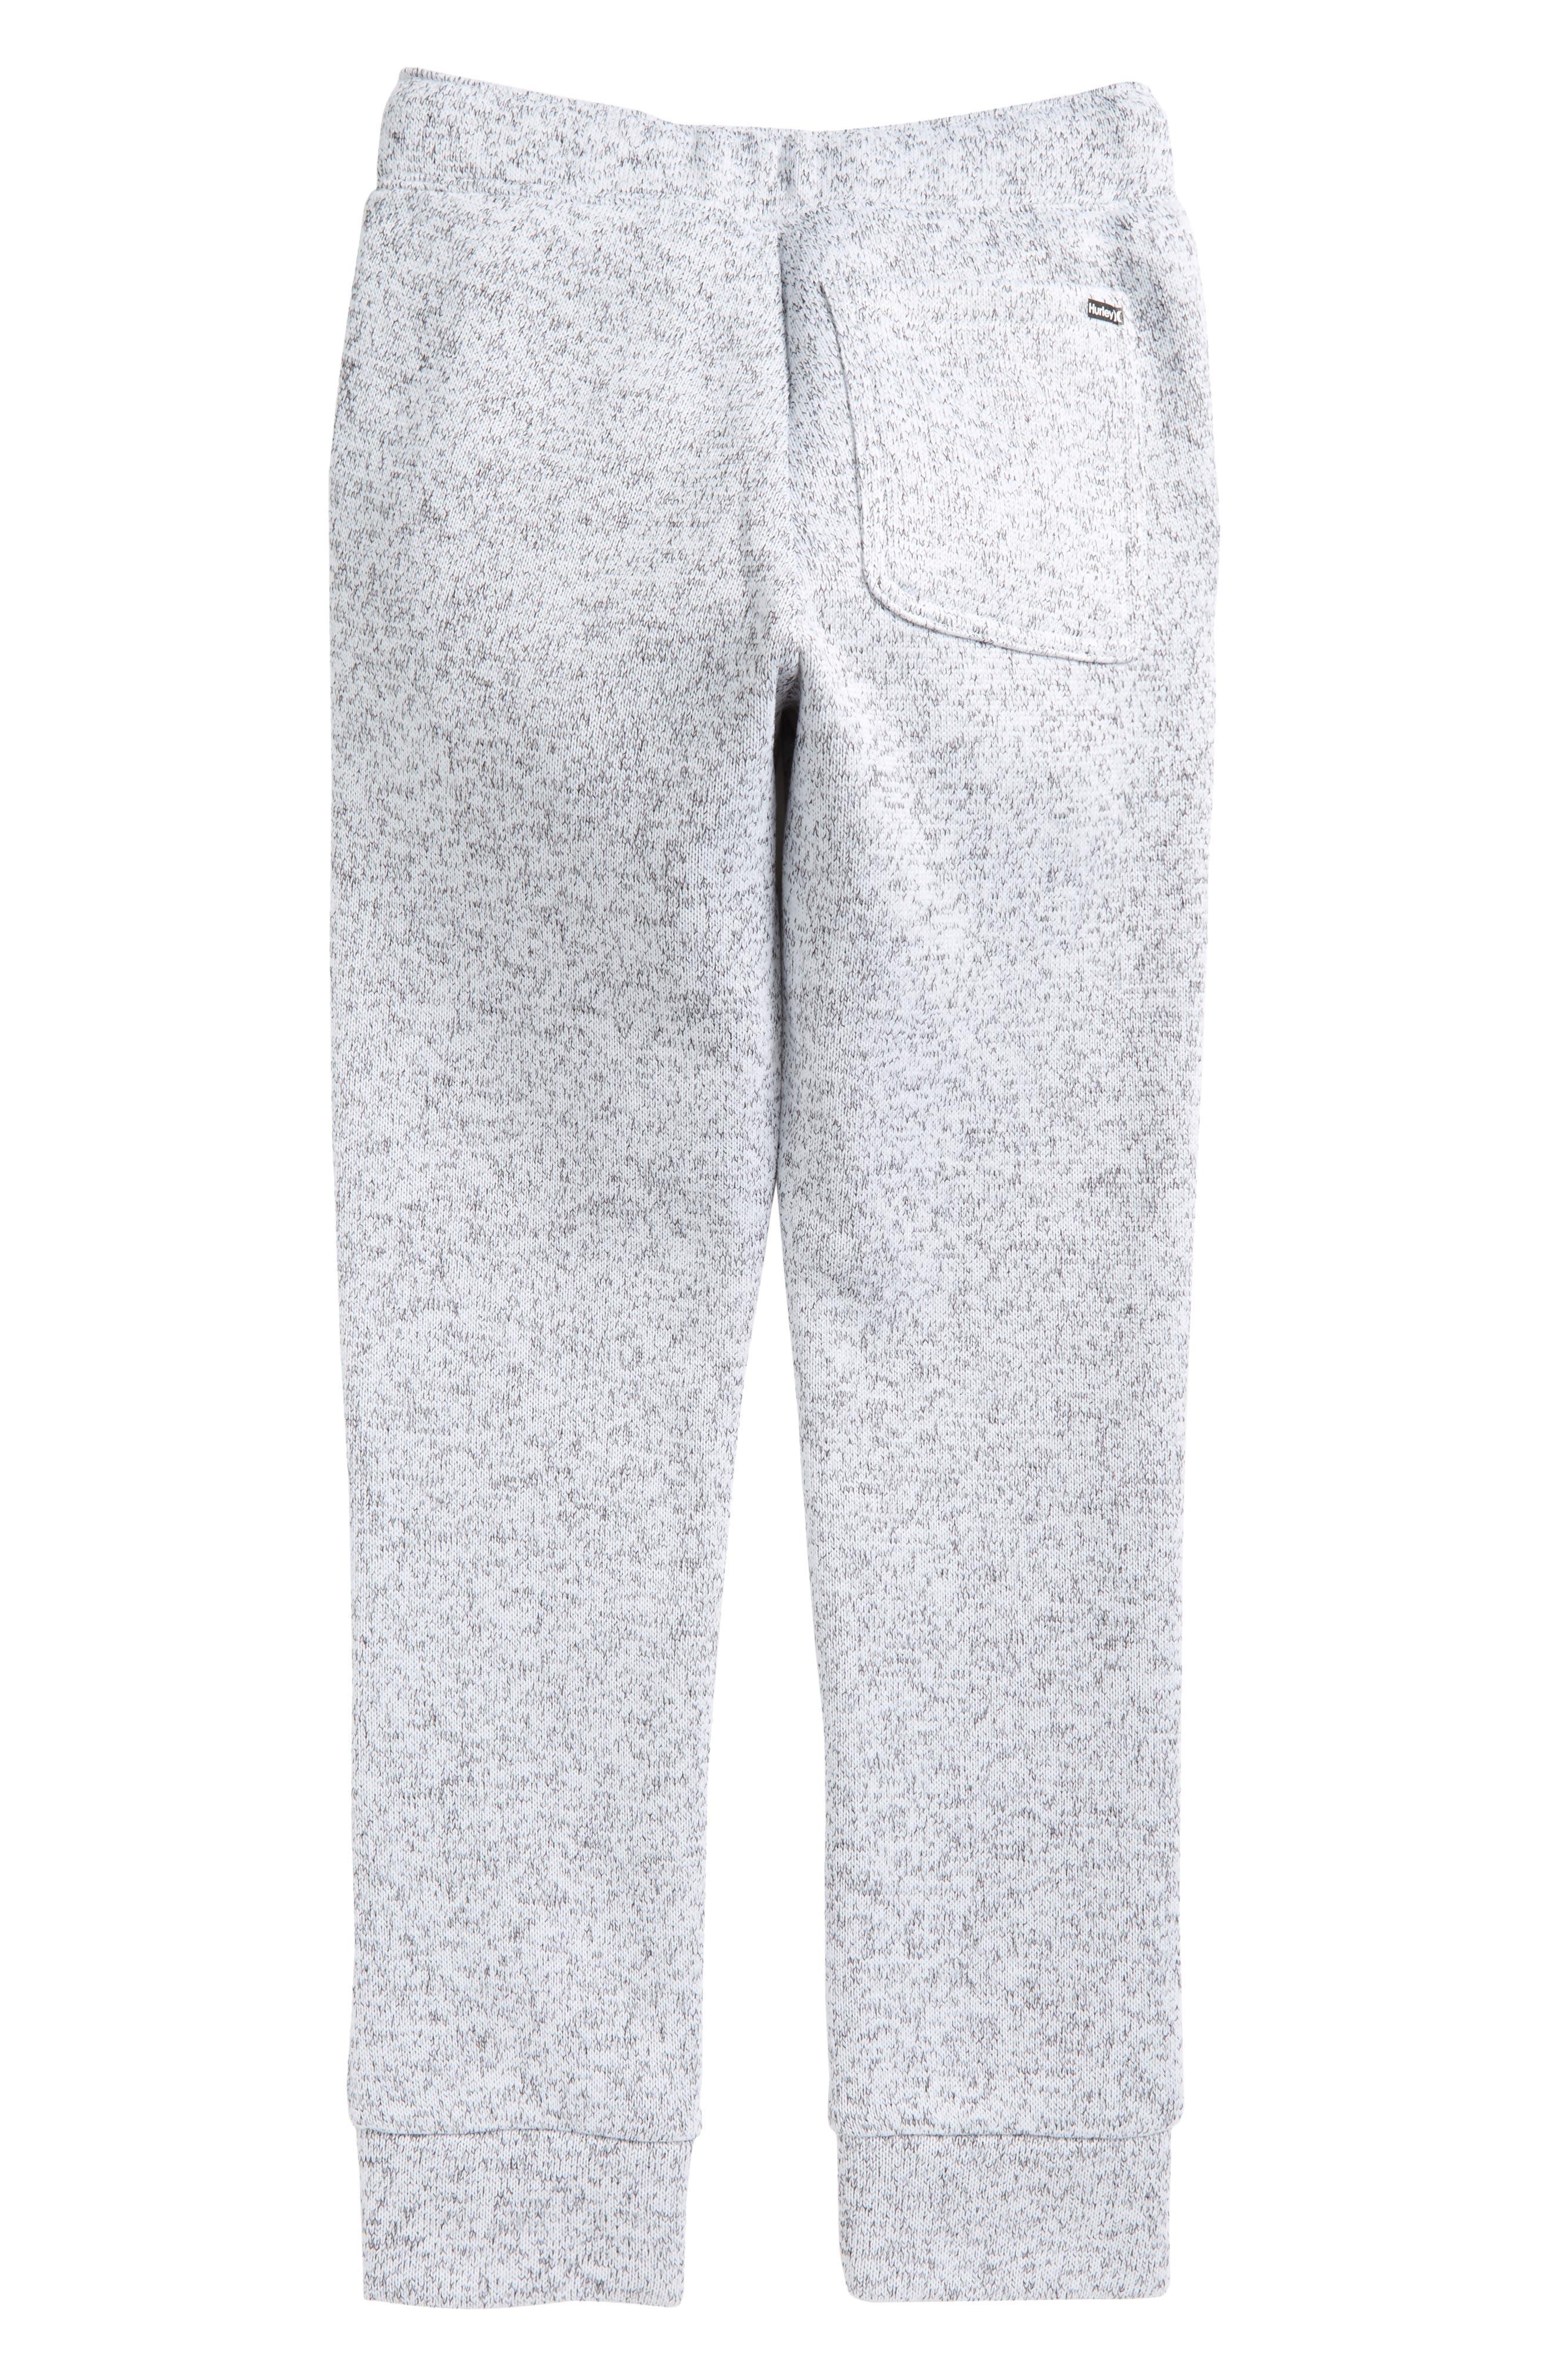 Sweater Knit Fleece Pants,                             Alternate thumbnail 4, color,